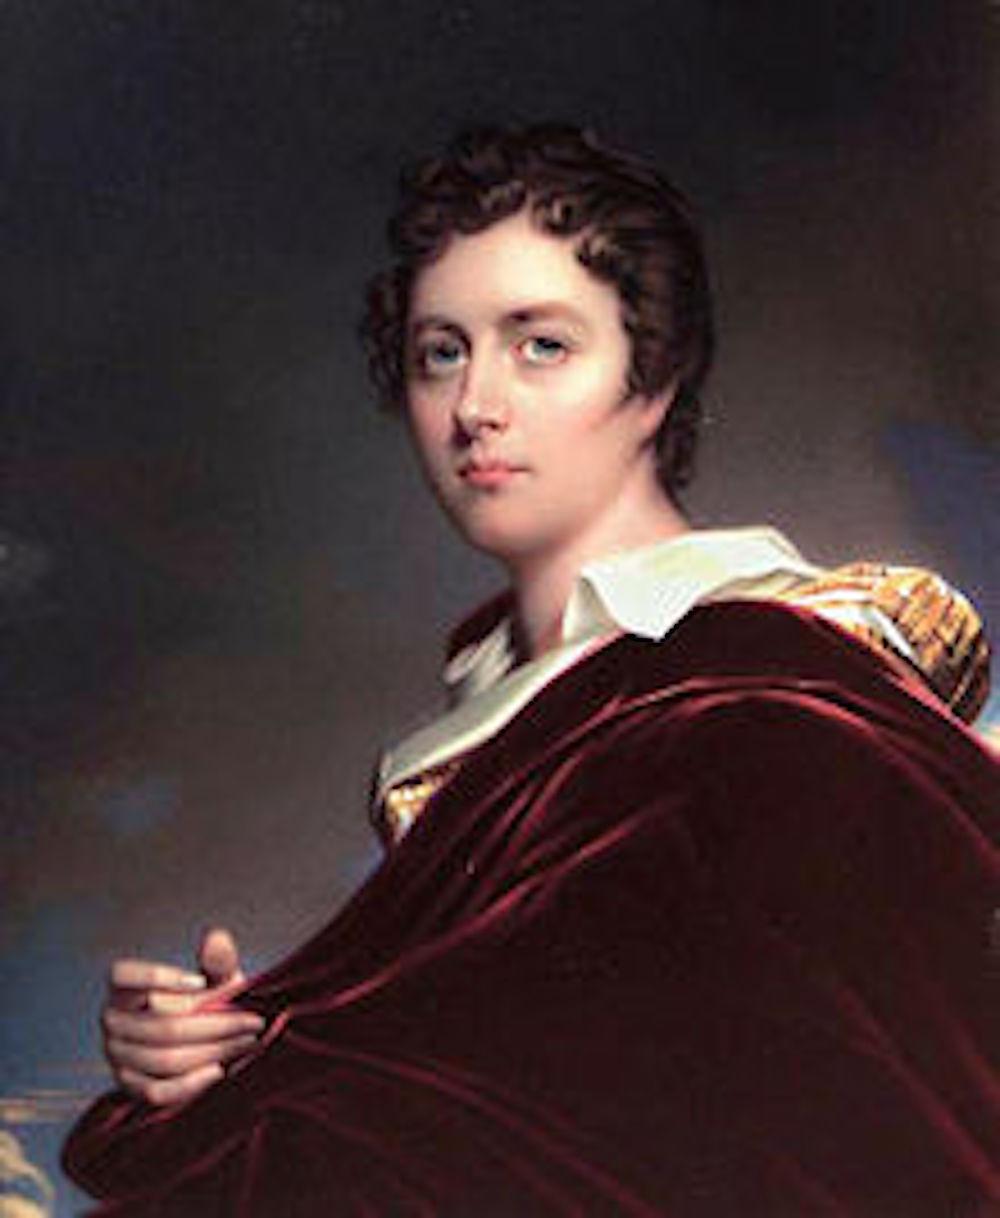 Lord Byron History Hustle image